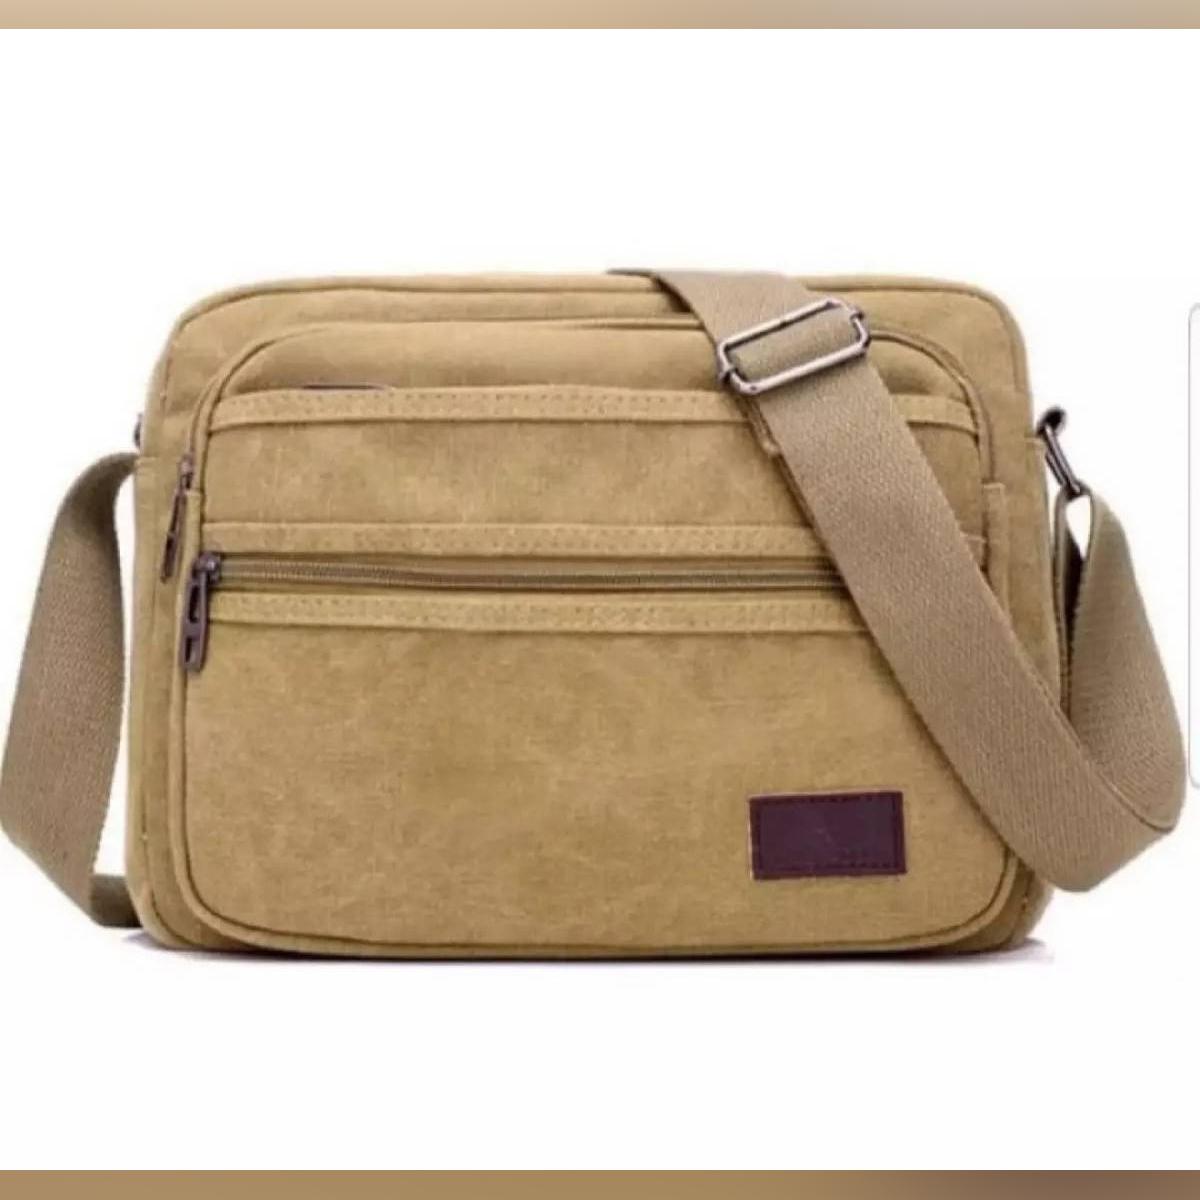 Man's Messenger Bag Men/Womes Shoulder PU Leather Chest Bags Crossbody Business